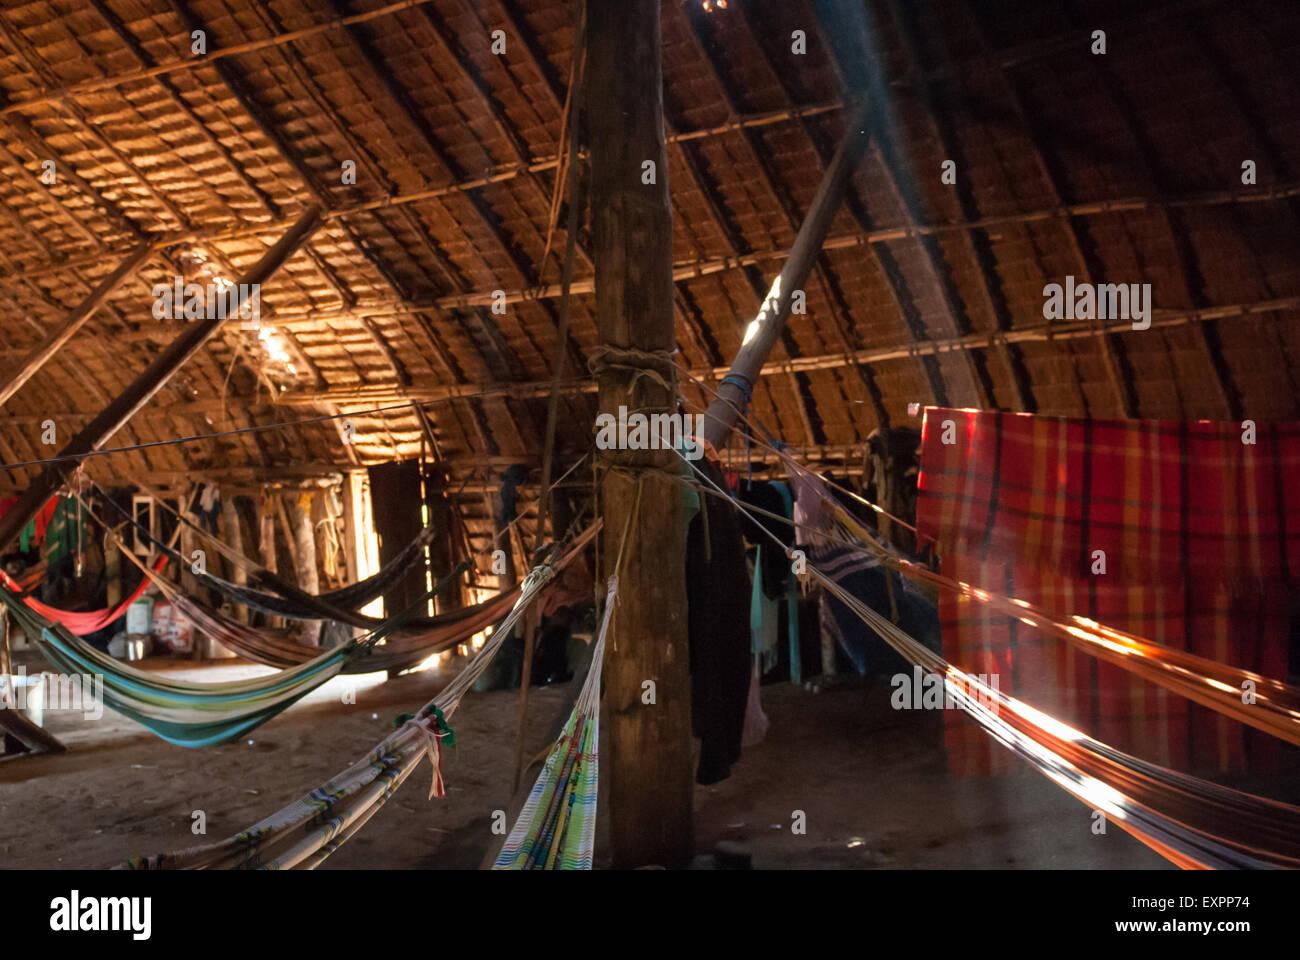 Xingu Indigenous Park, Mato Grosso, Brazil. Aldeia Matipu. Guest hammocks in traditional Oca house. - Stock Image